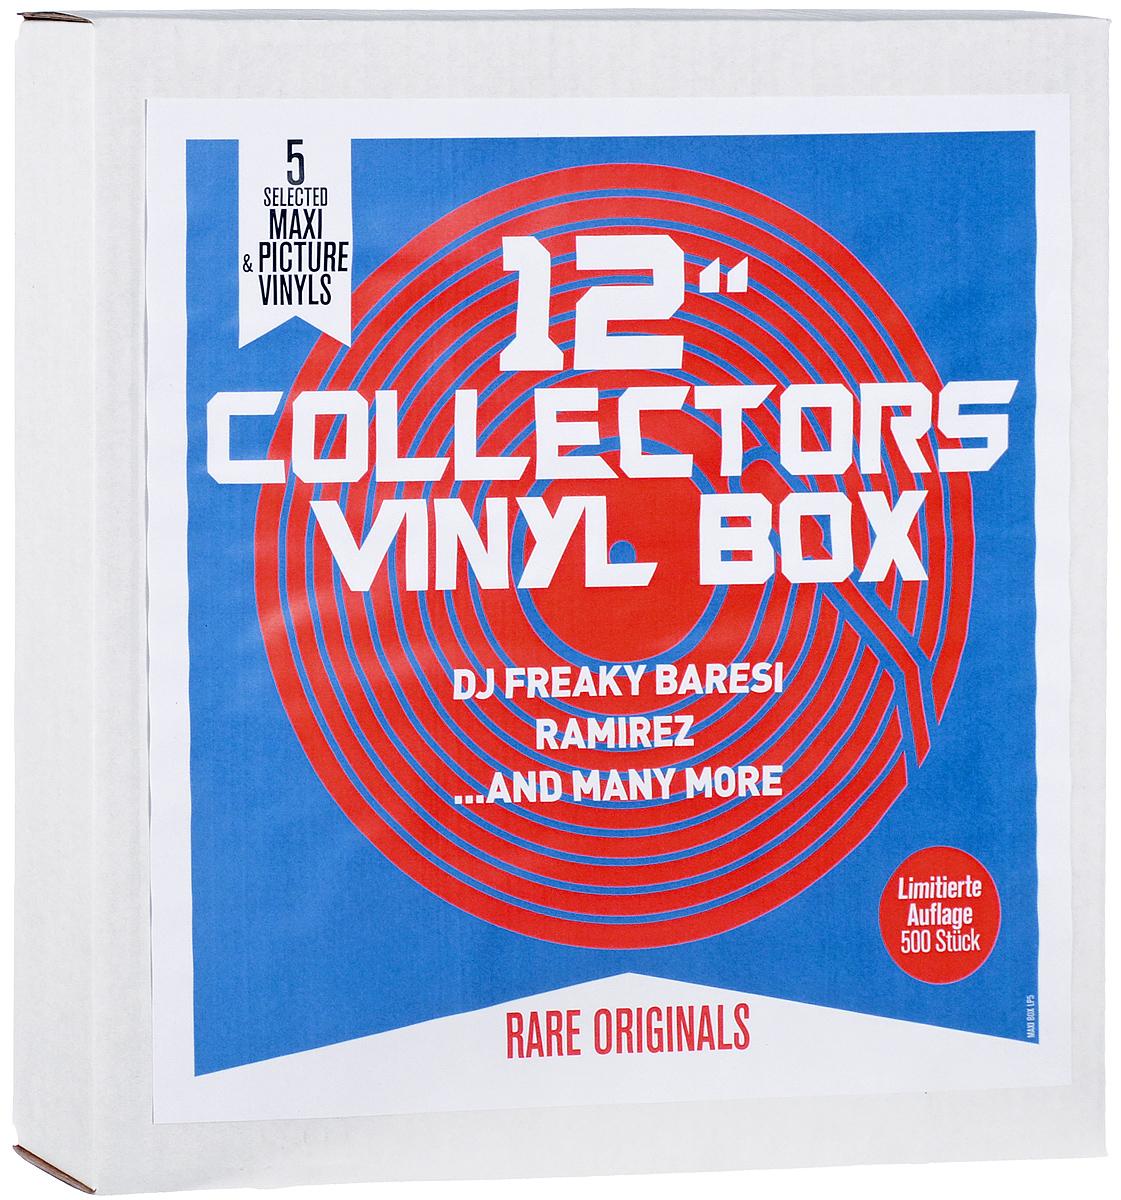 Ramirez,The Shrink,Branko,The First Trance Opera,DJ Freaky Baresi,Rico Ravanelli 12 Collector's Box (5 LP) the first trance opera of the world